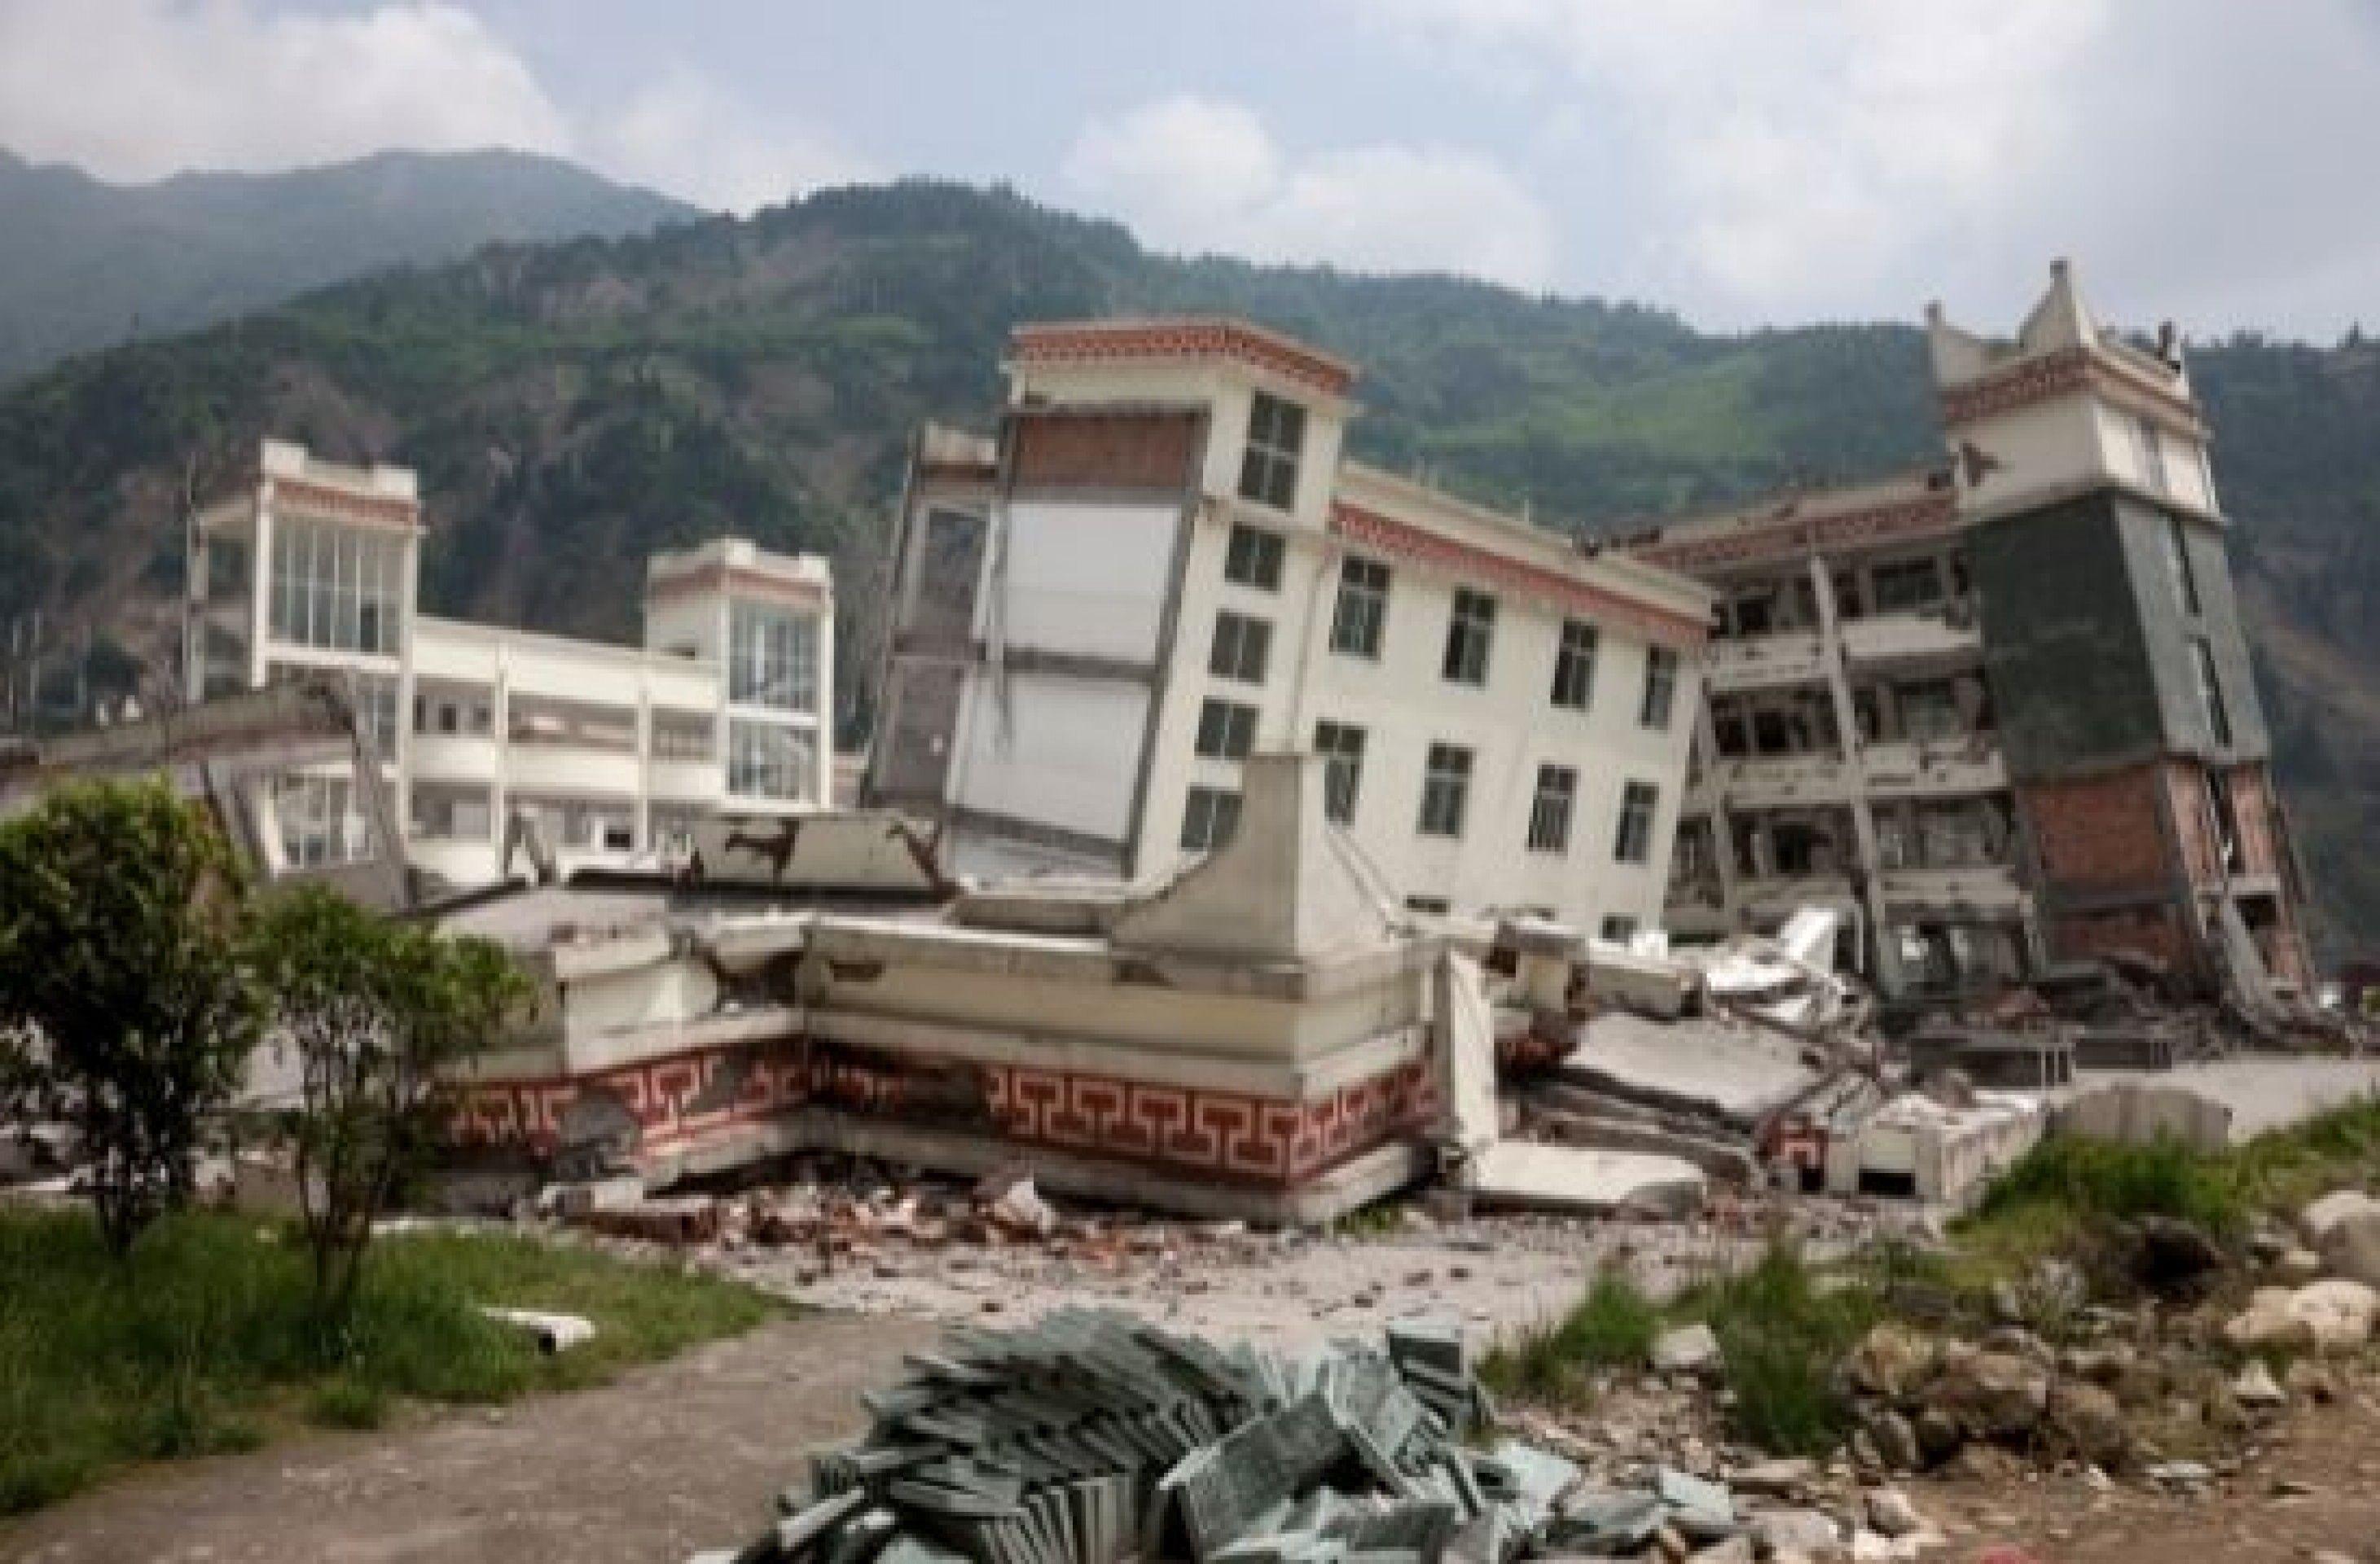 Earthquake Survival: What To Do During A Quake?